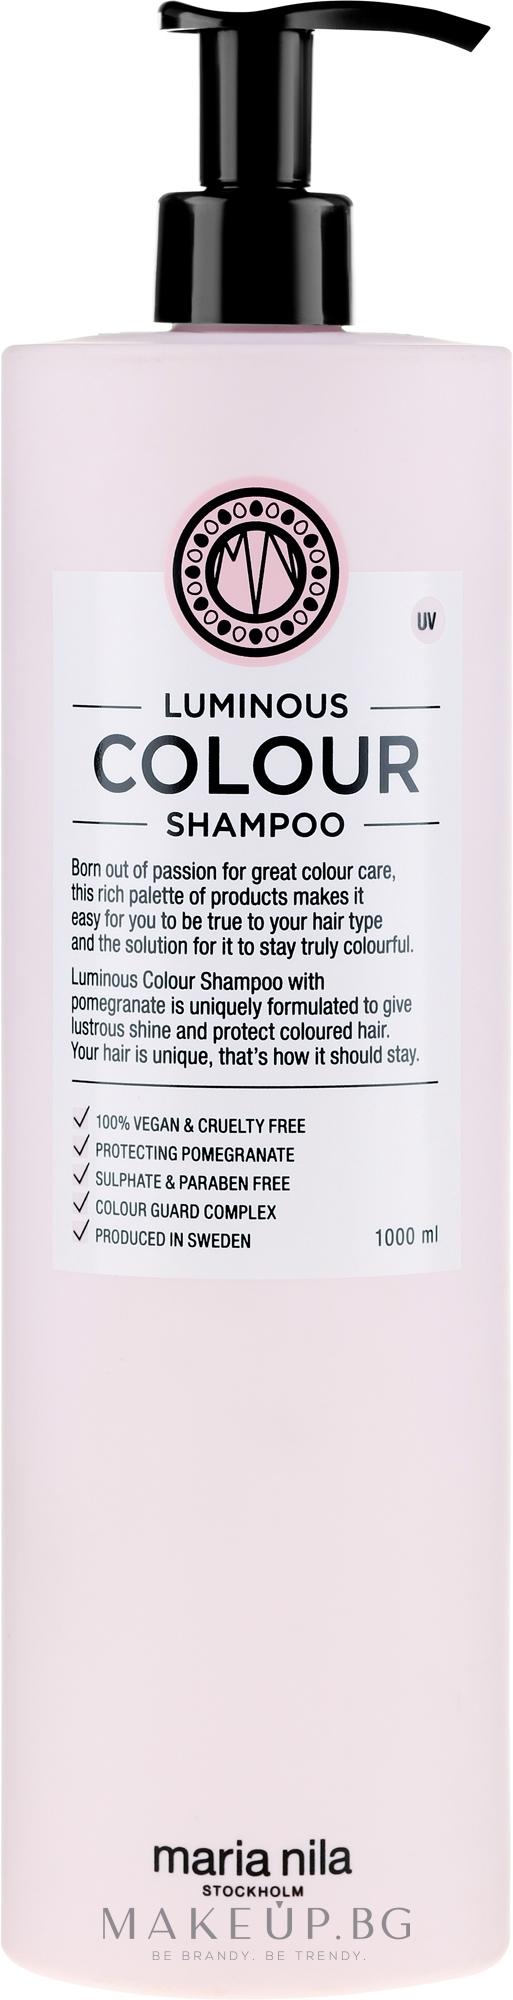 Шампоан за боядисана коса - Maria Nila Luminous Color Shampoo — снимка 1000 ml